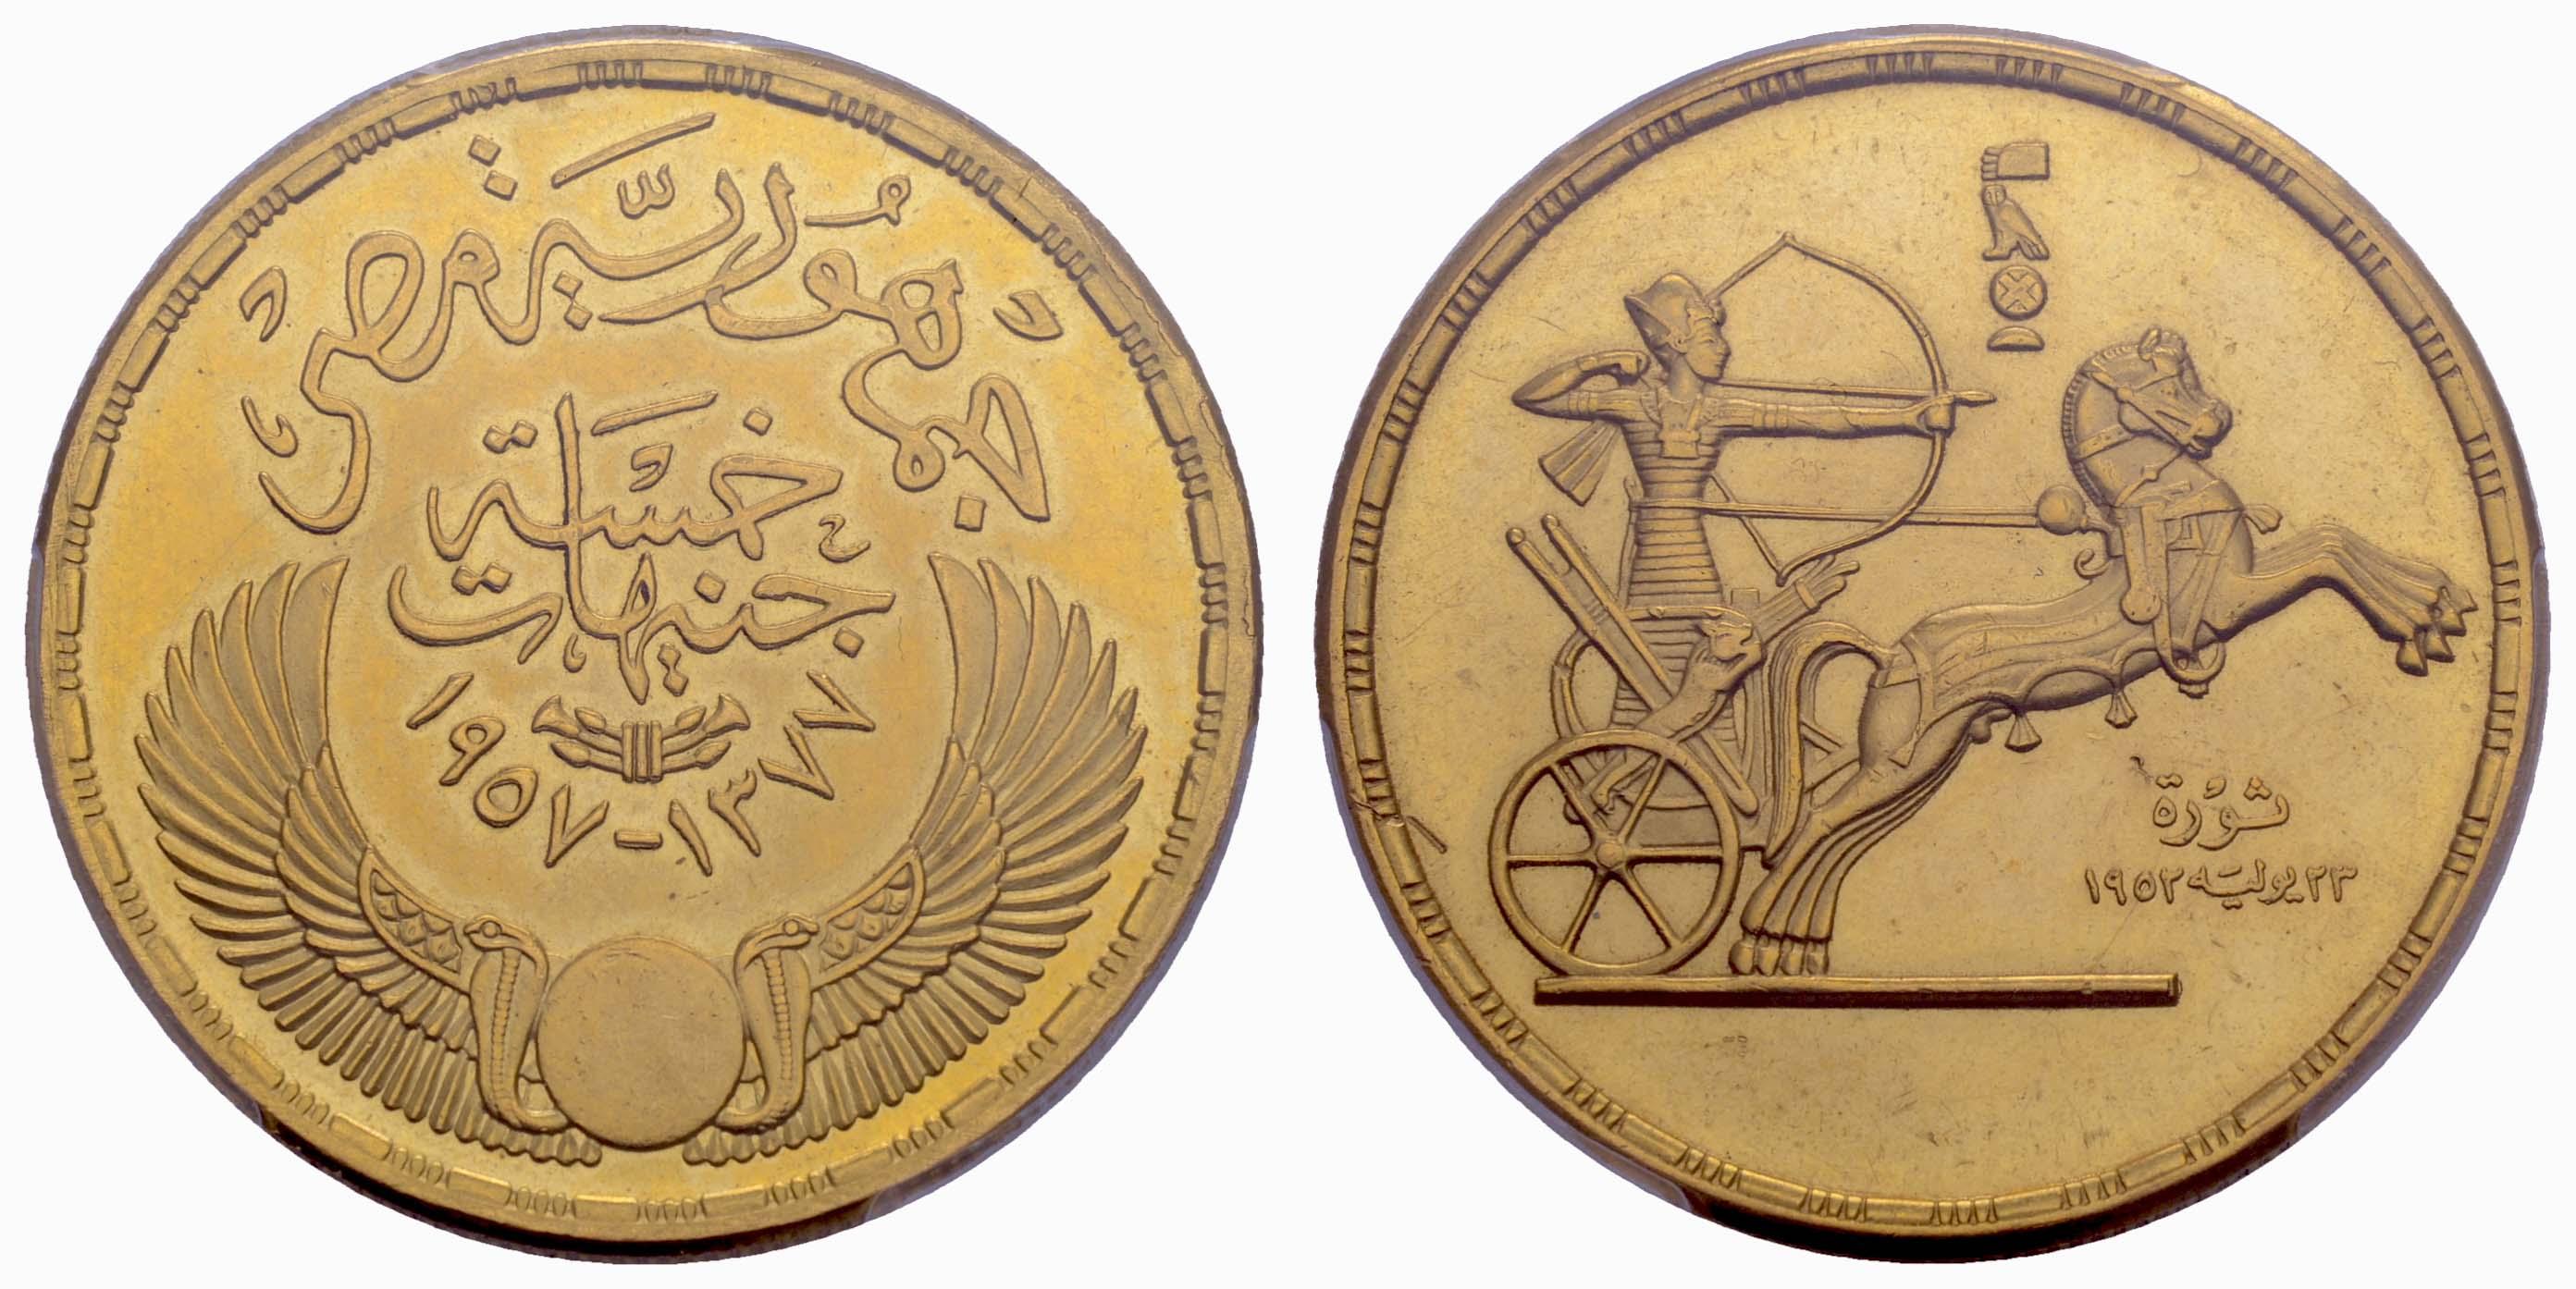 Lot 1855 - übersee ägypten -  Auktionshaus Ulrich Felzmann GmbH & Co. KG Coins single lots